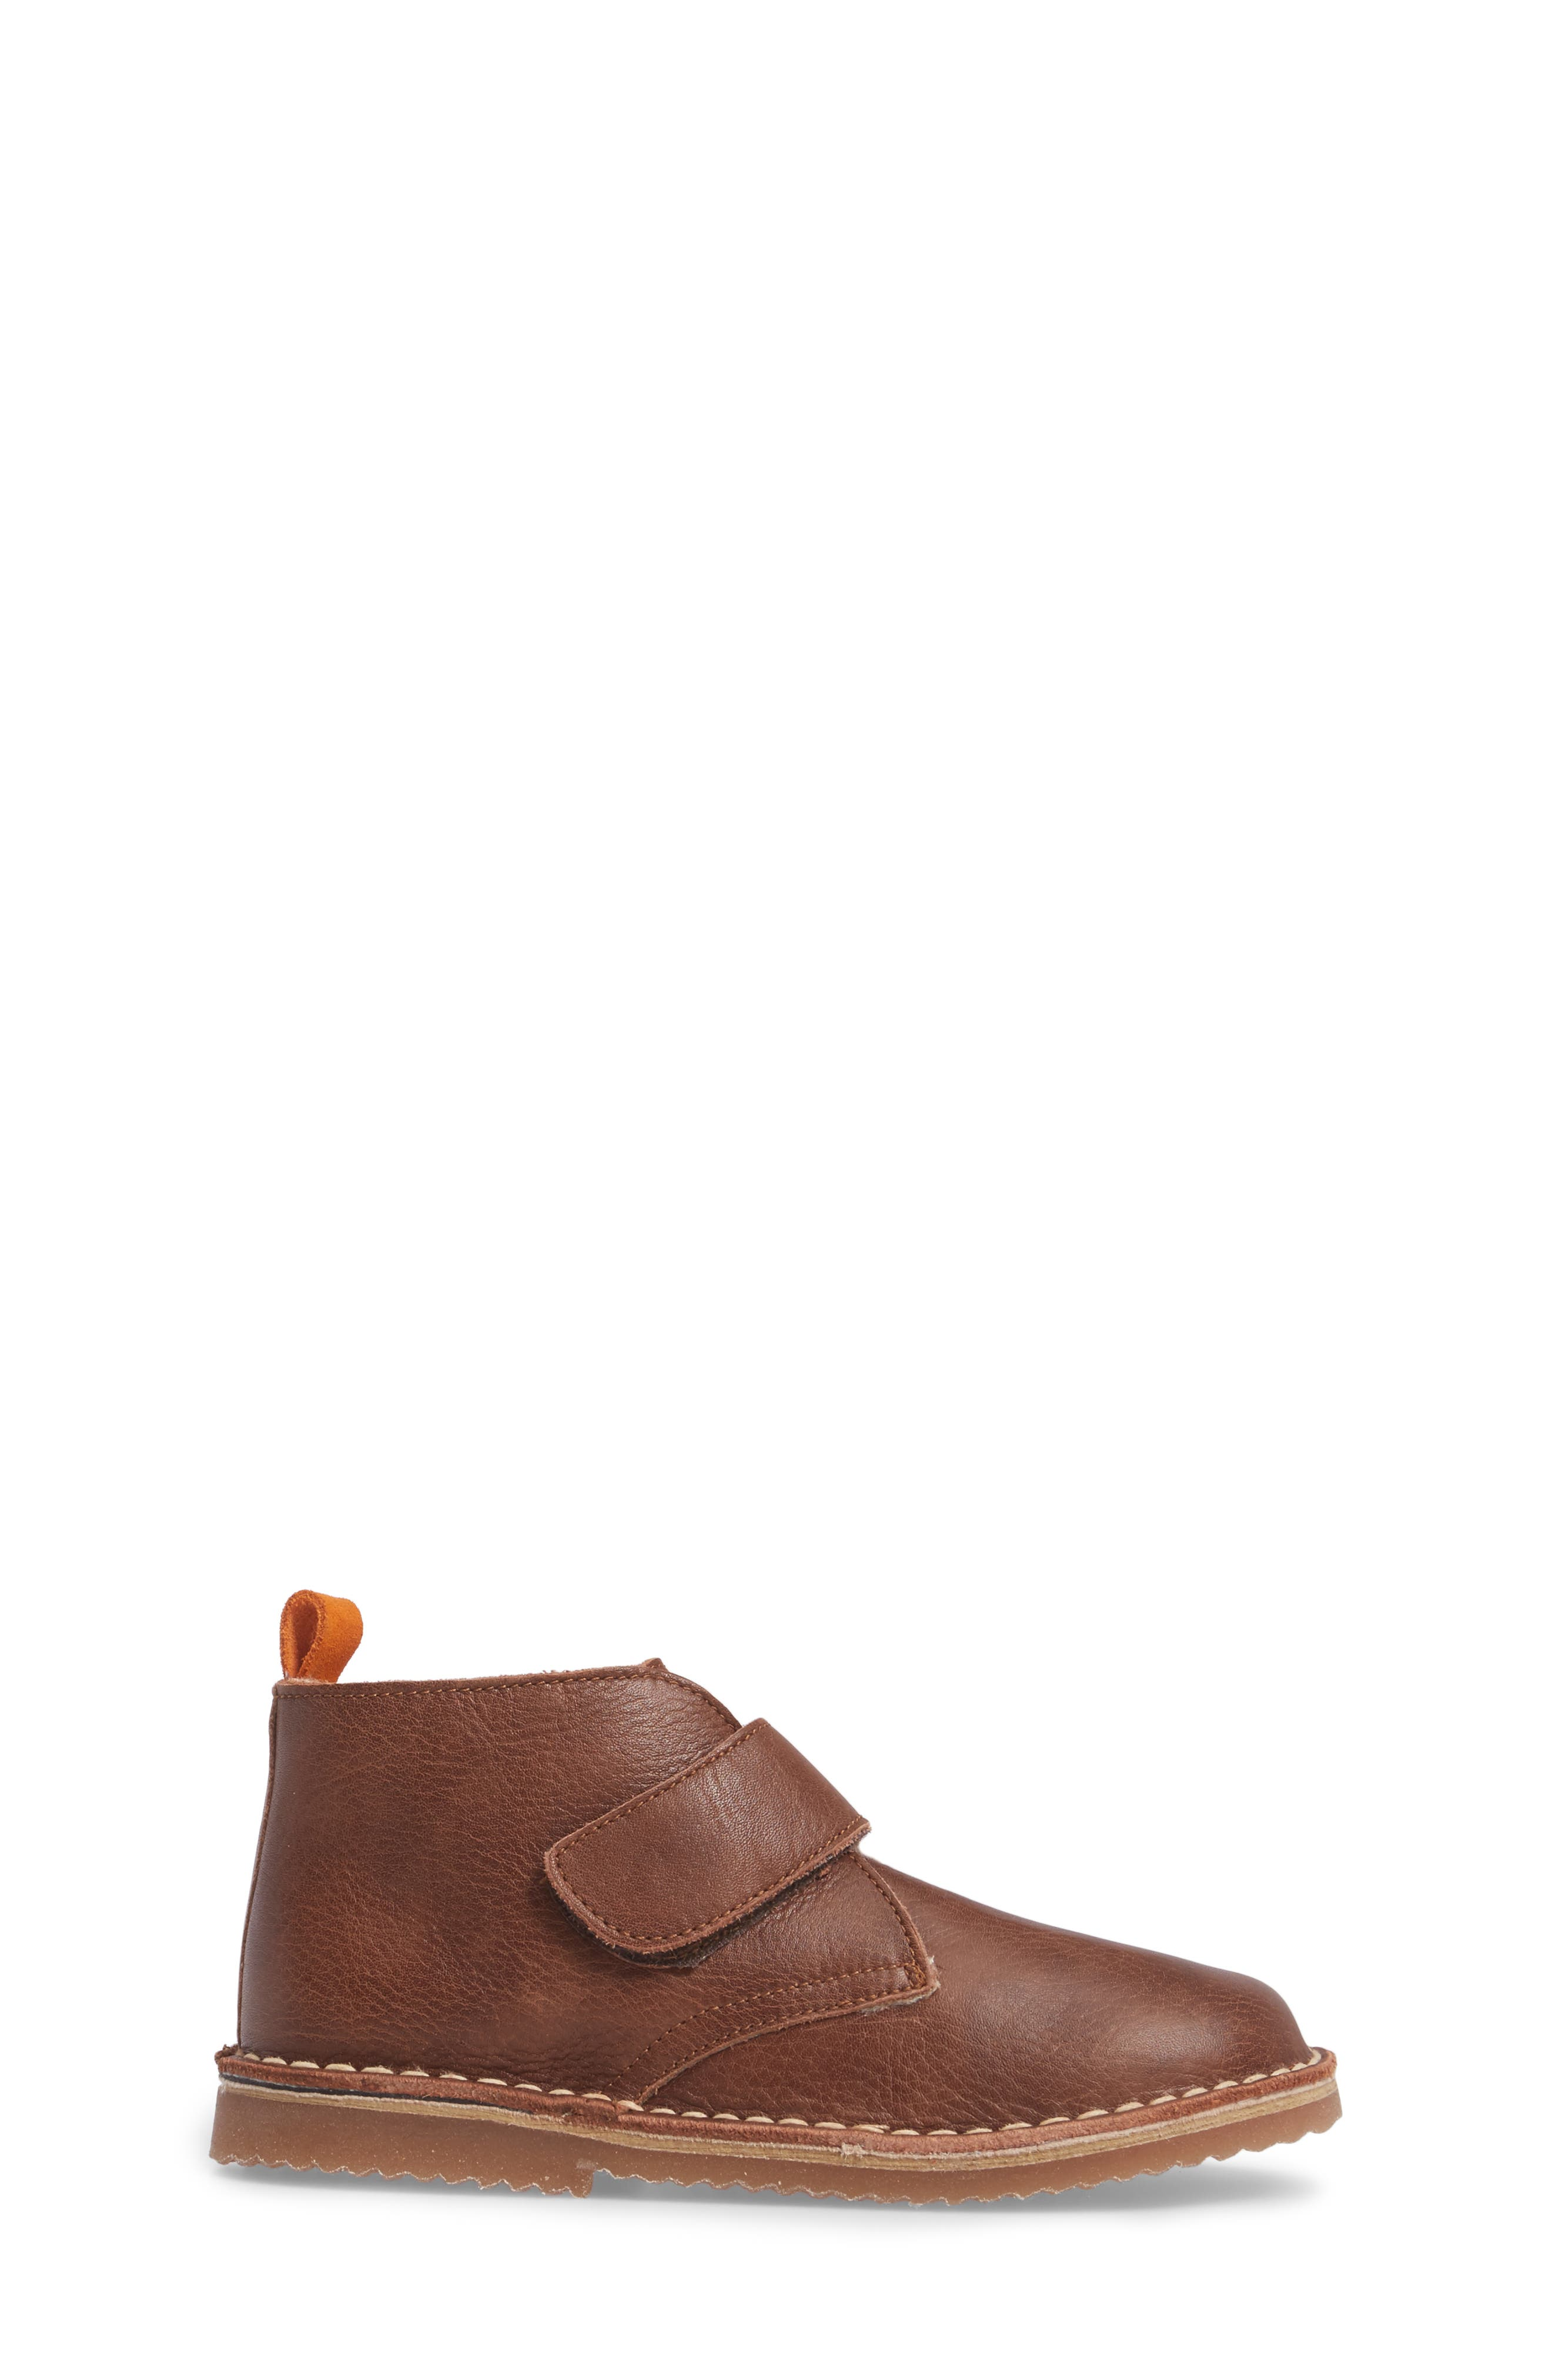 Faux Fur Desert Boot,                             Alternate thumbnail 3, color,                             Brown